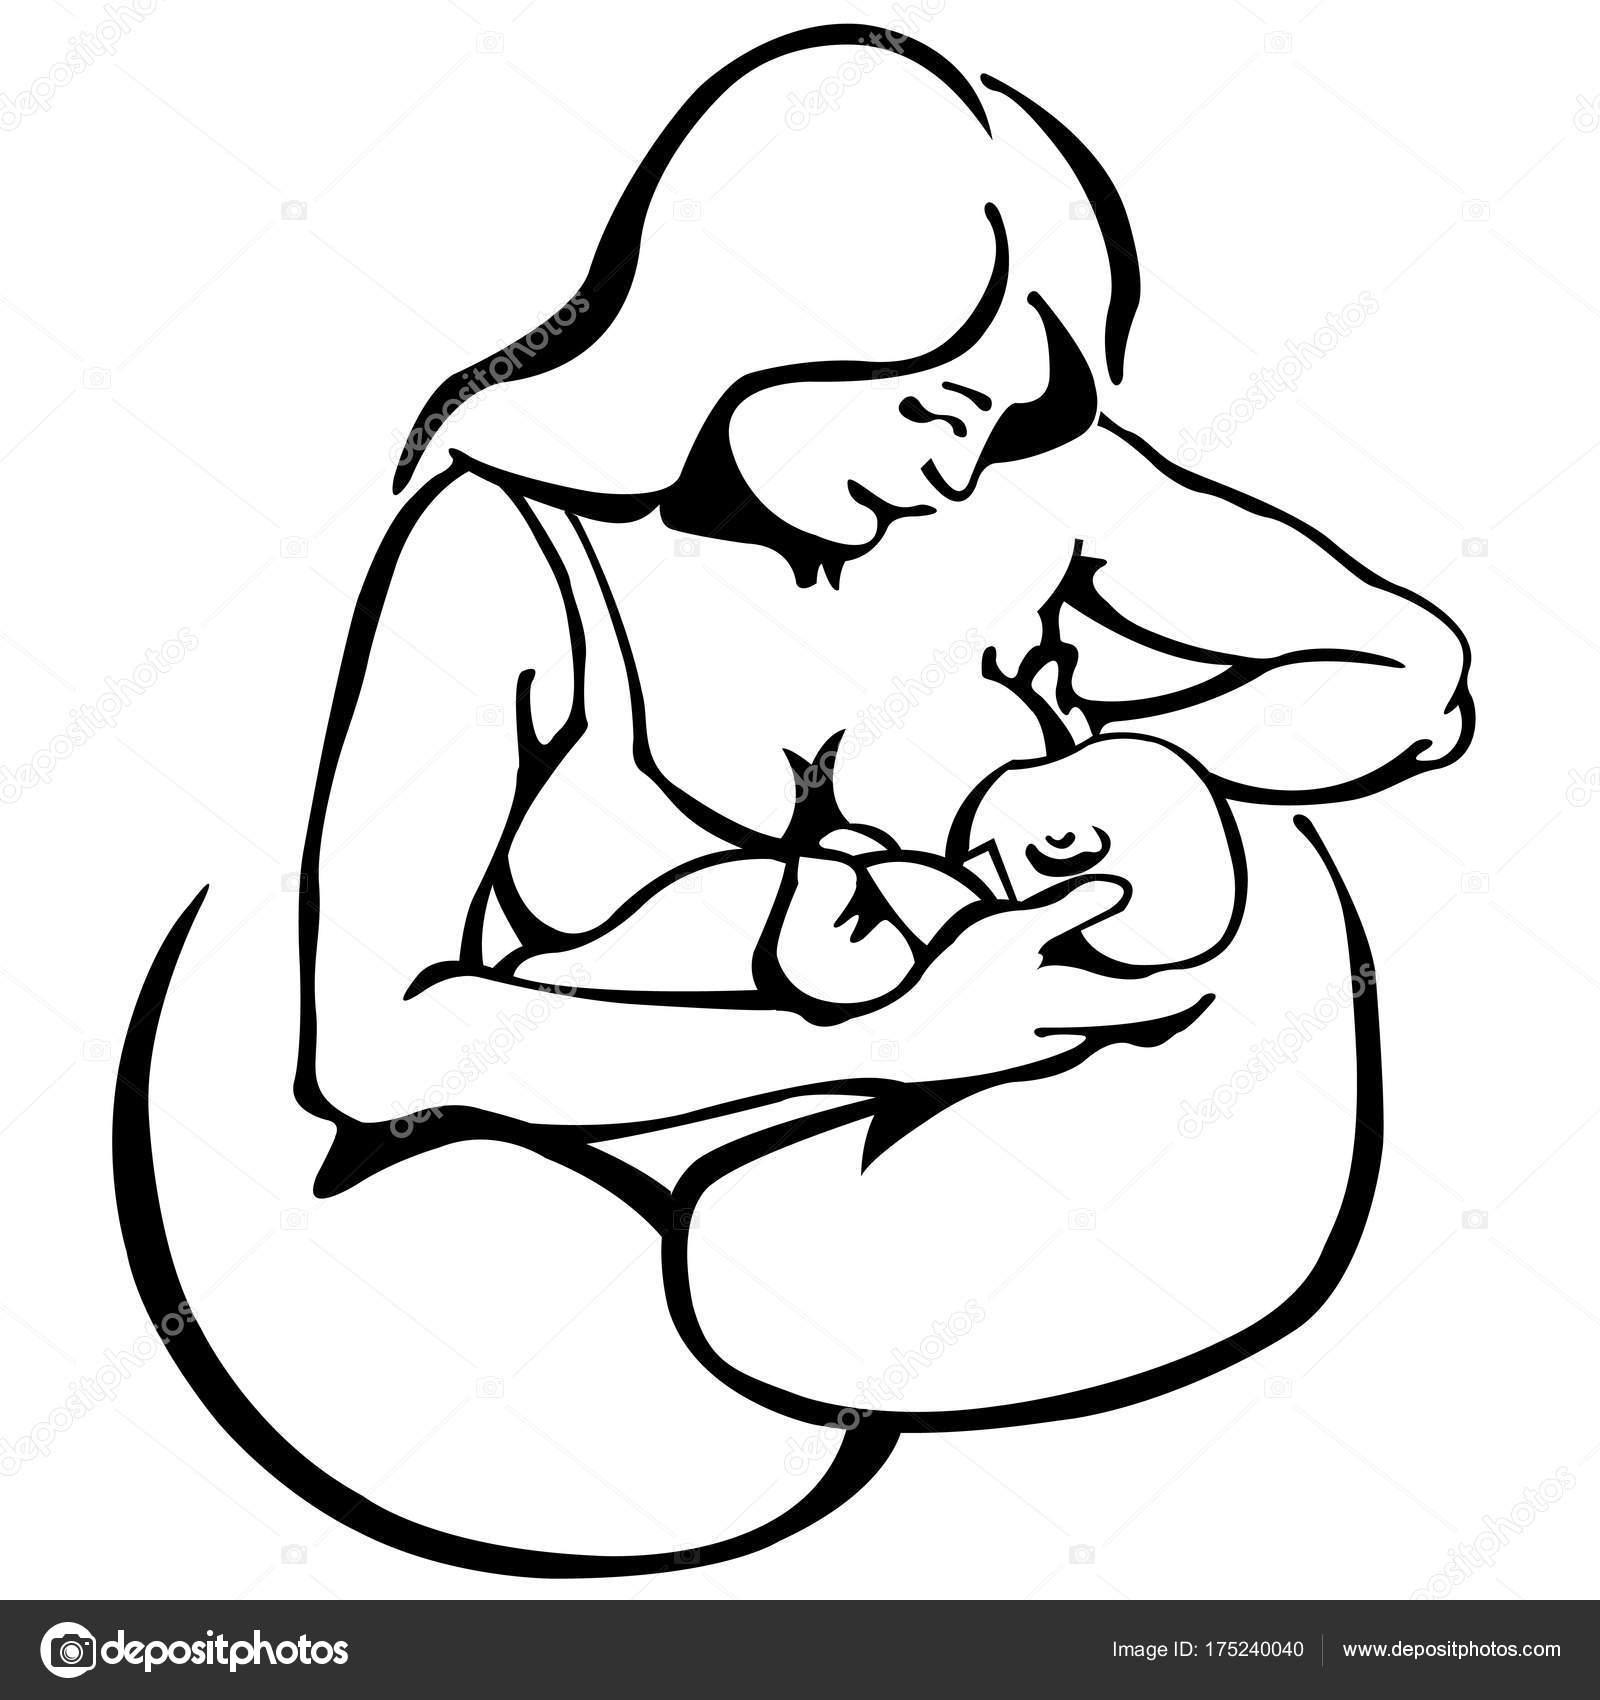 La Lactancia Materna Sketch Coloring Page